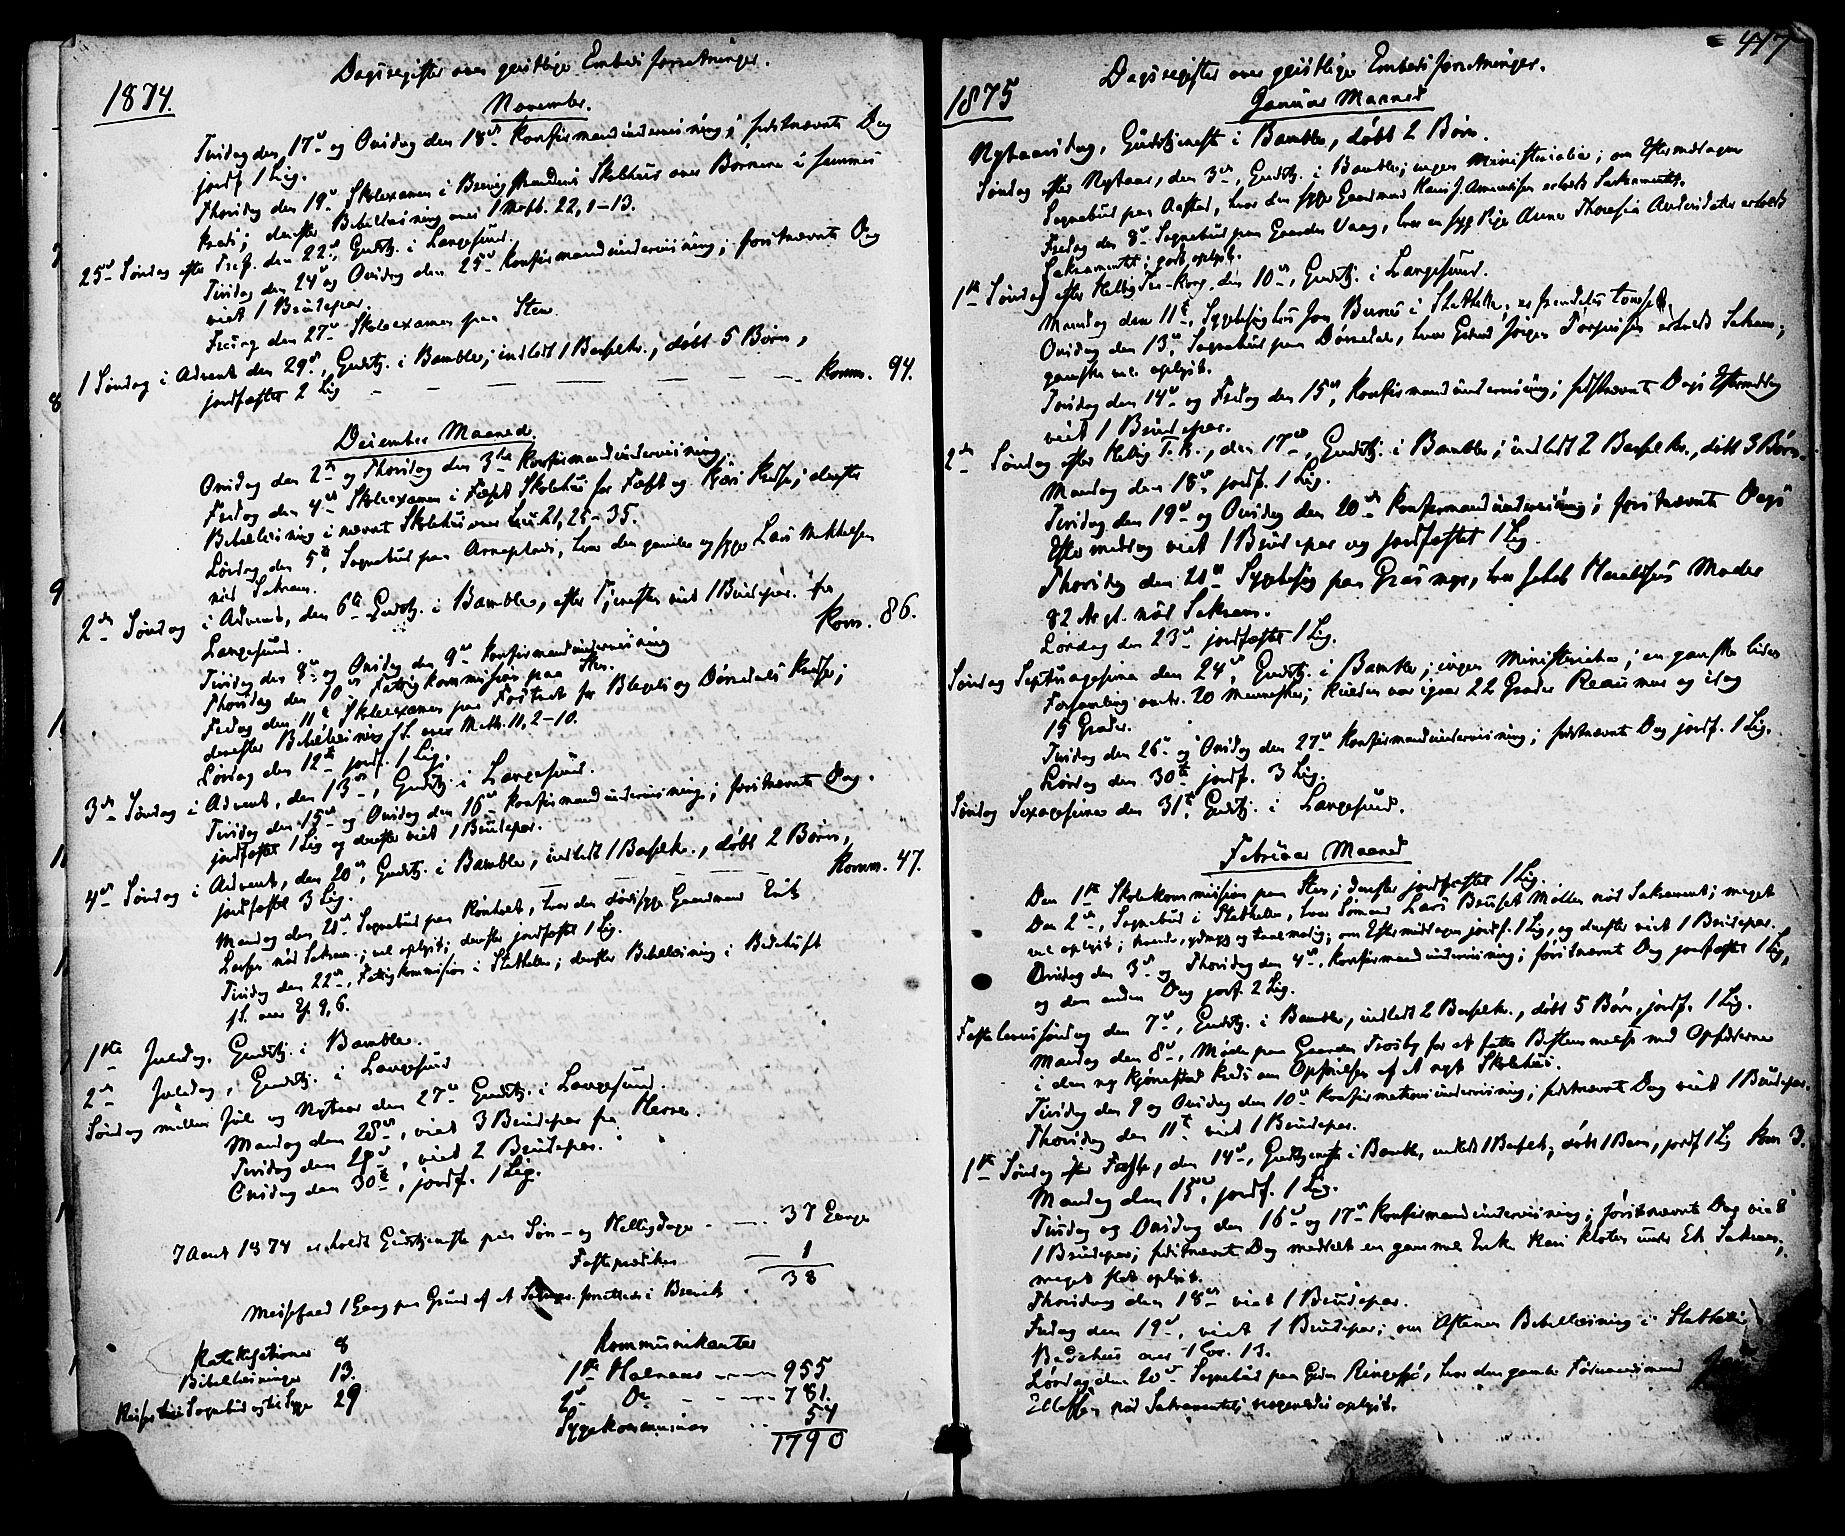 SAKO, Bamble kirkebøker, F/Fa/L0006: Ministerialbok nr. I 6, 1869-1877, s. 417